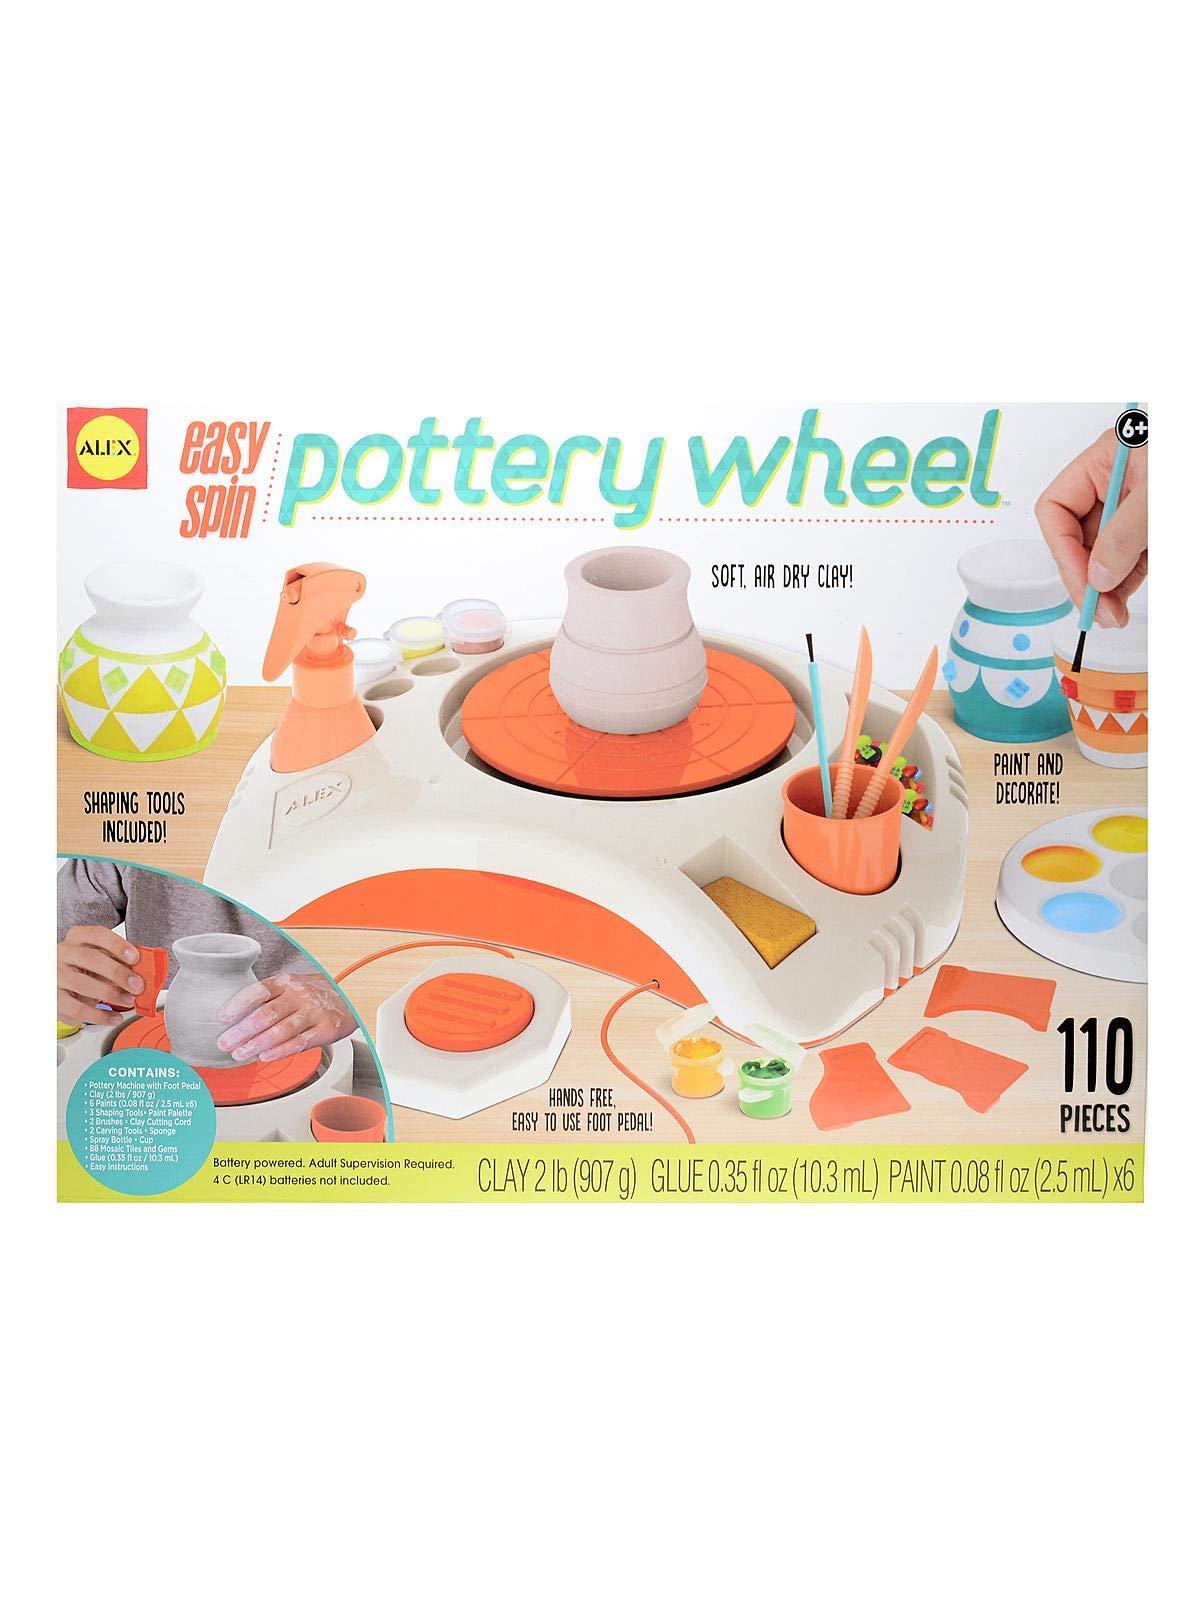 Deluxe Pottery Wheel Kit 1 pcs SKU# 1172324MA